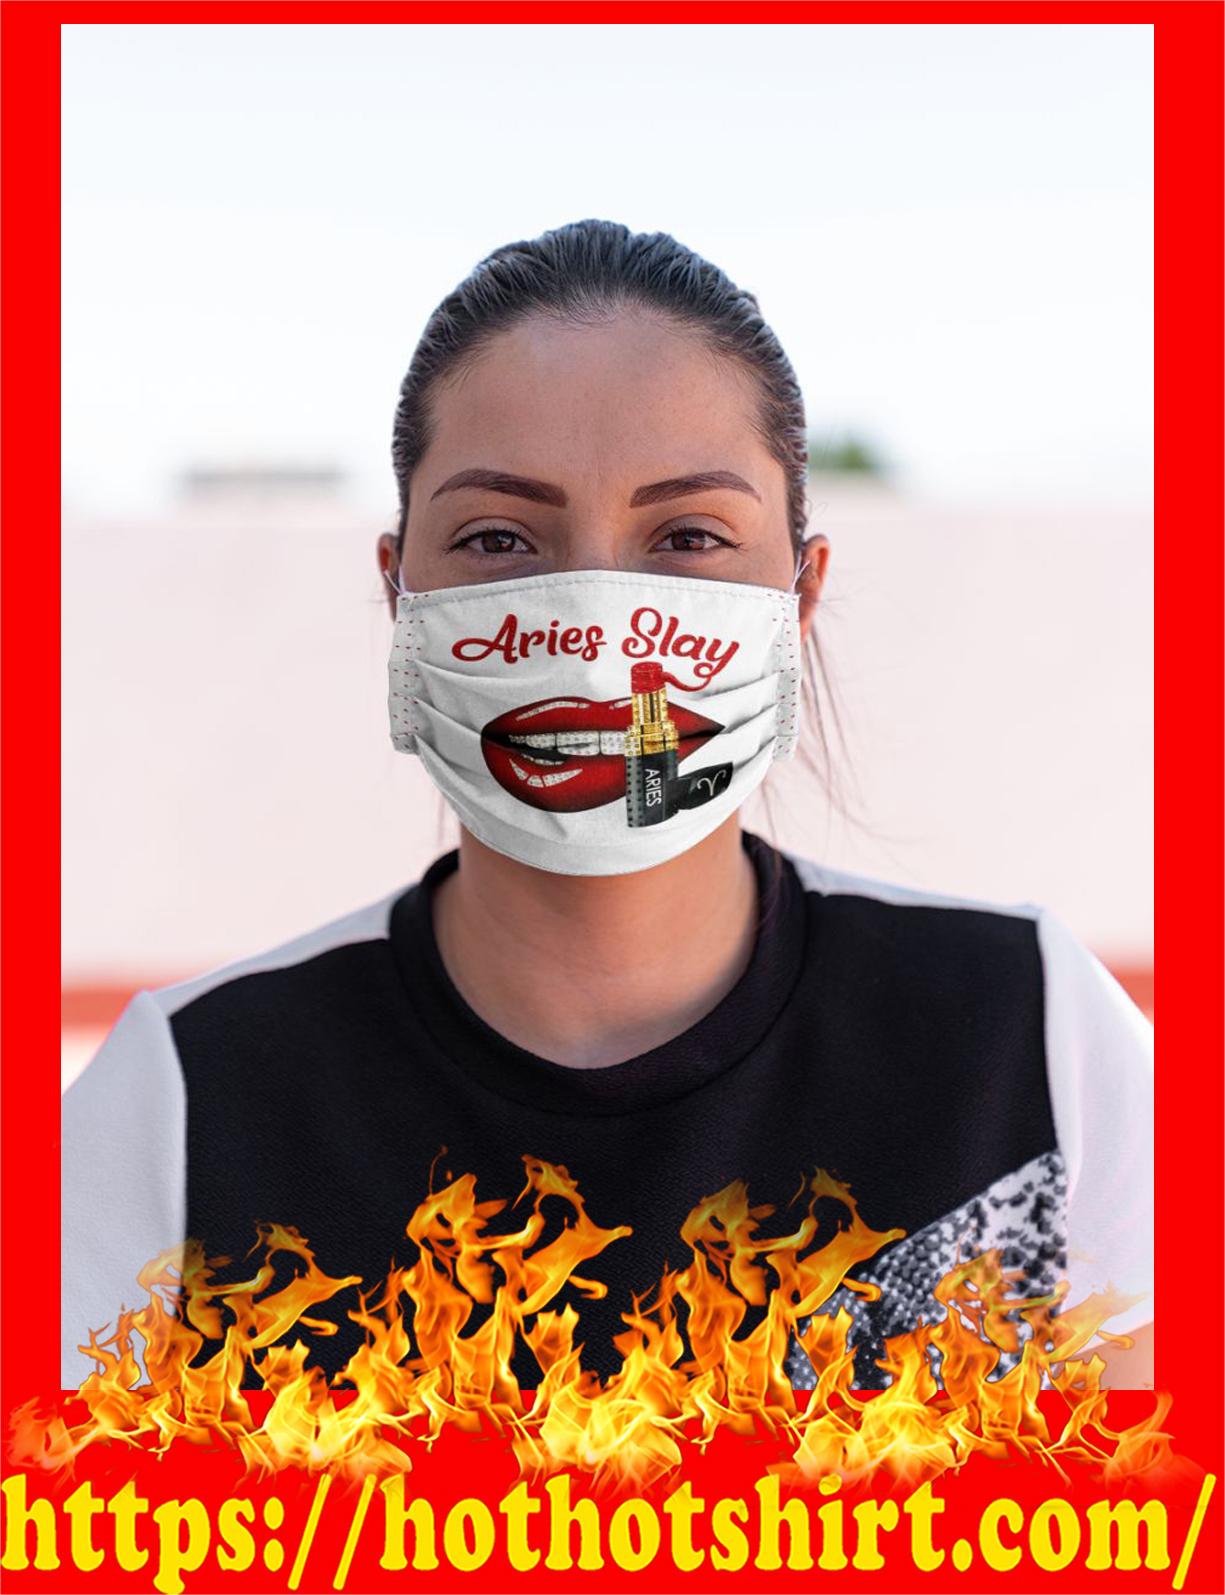 Lips aries slay face mask